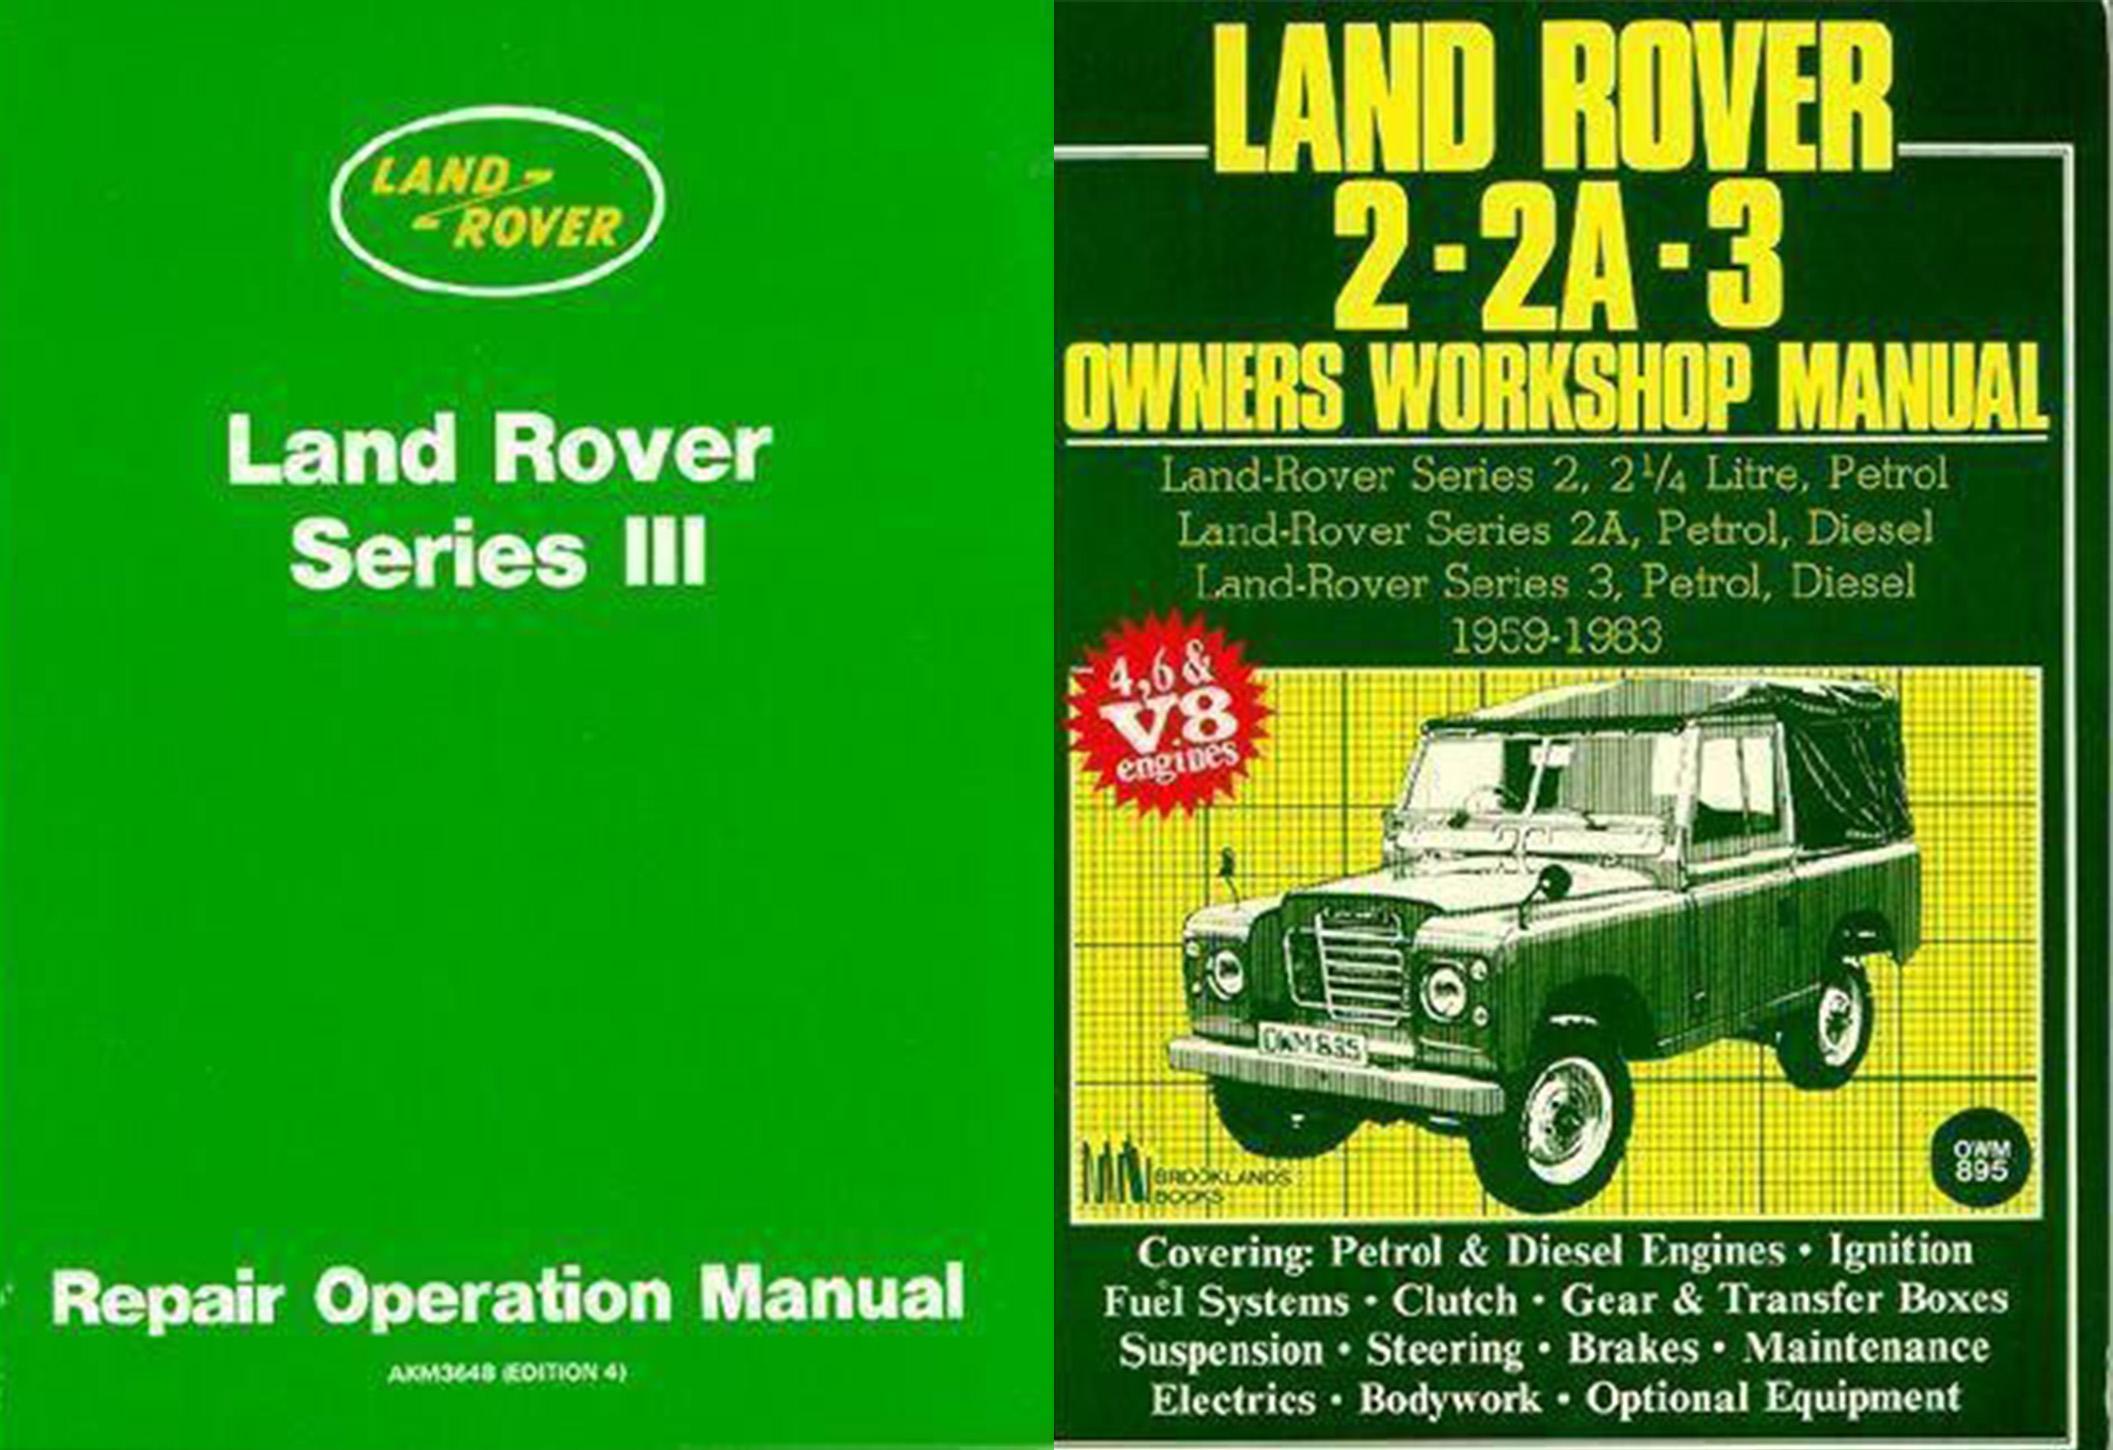 factory land rover series 3 repair operation manual & 2 - 2a - 3